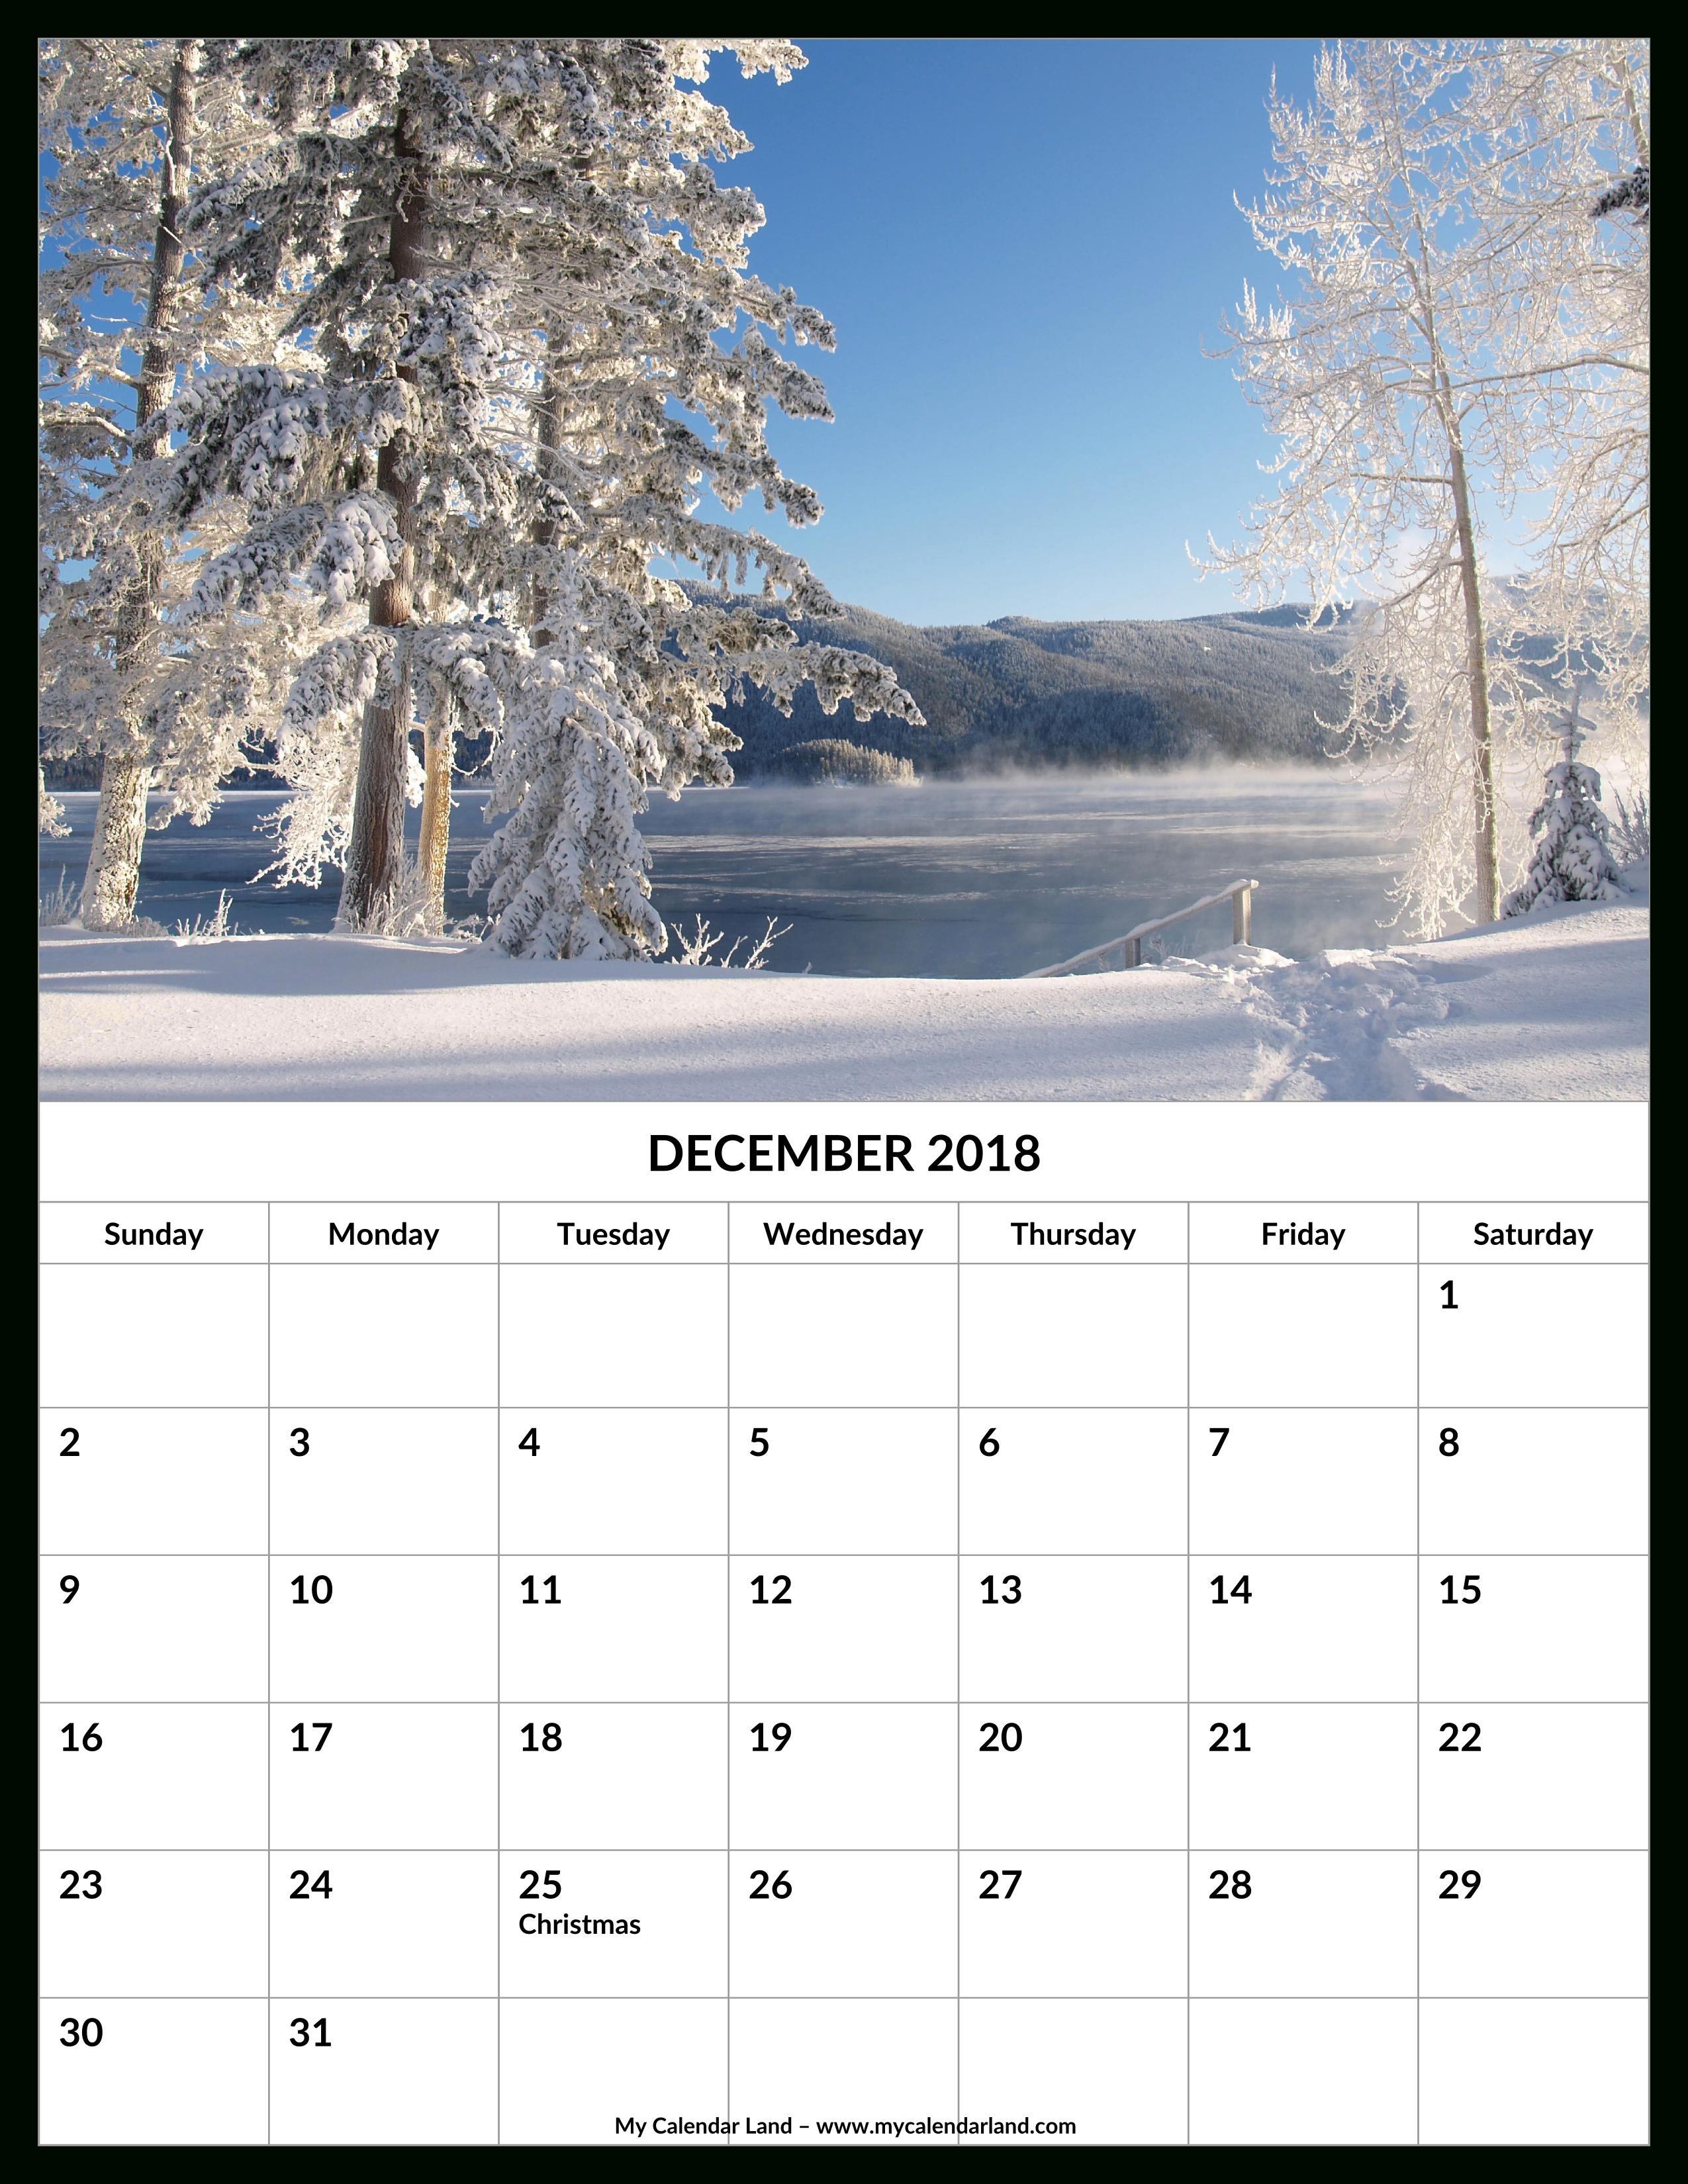 December 2018 Calendar - My Calendar Land within Christmas Themed Calendar Templates